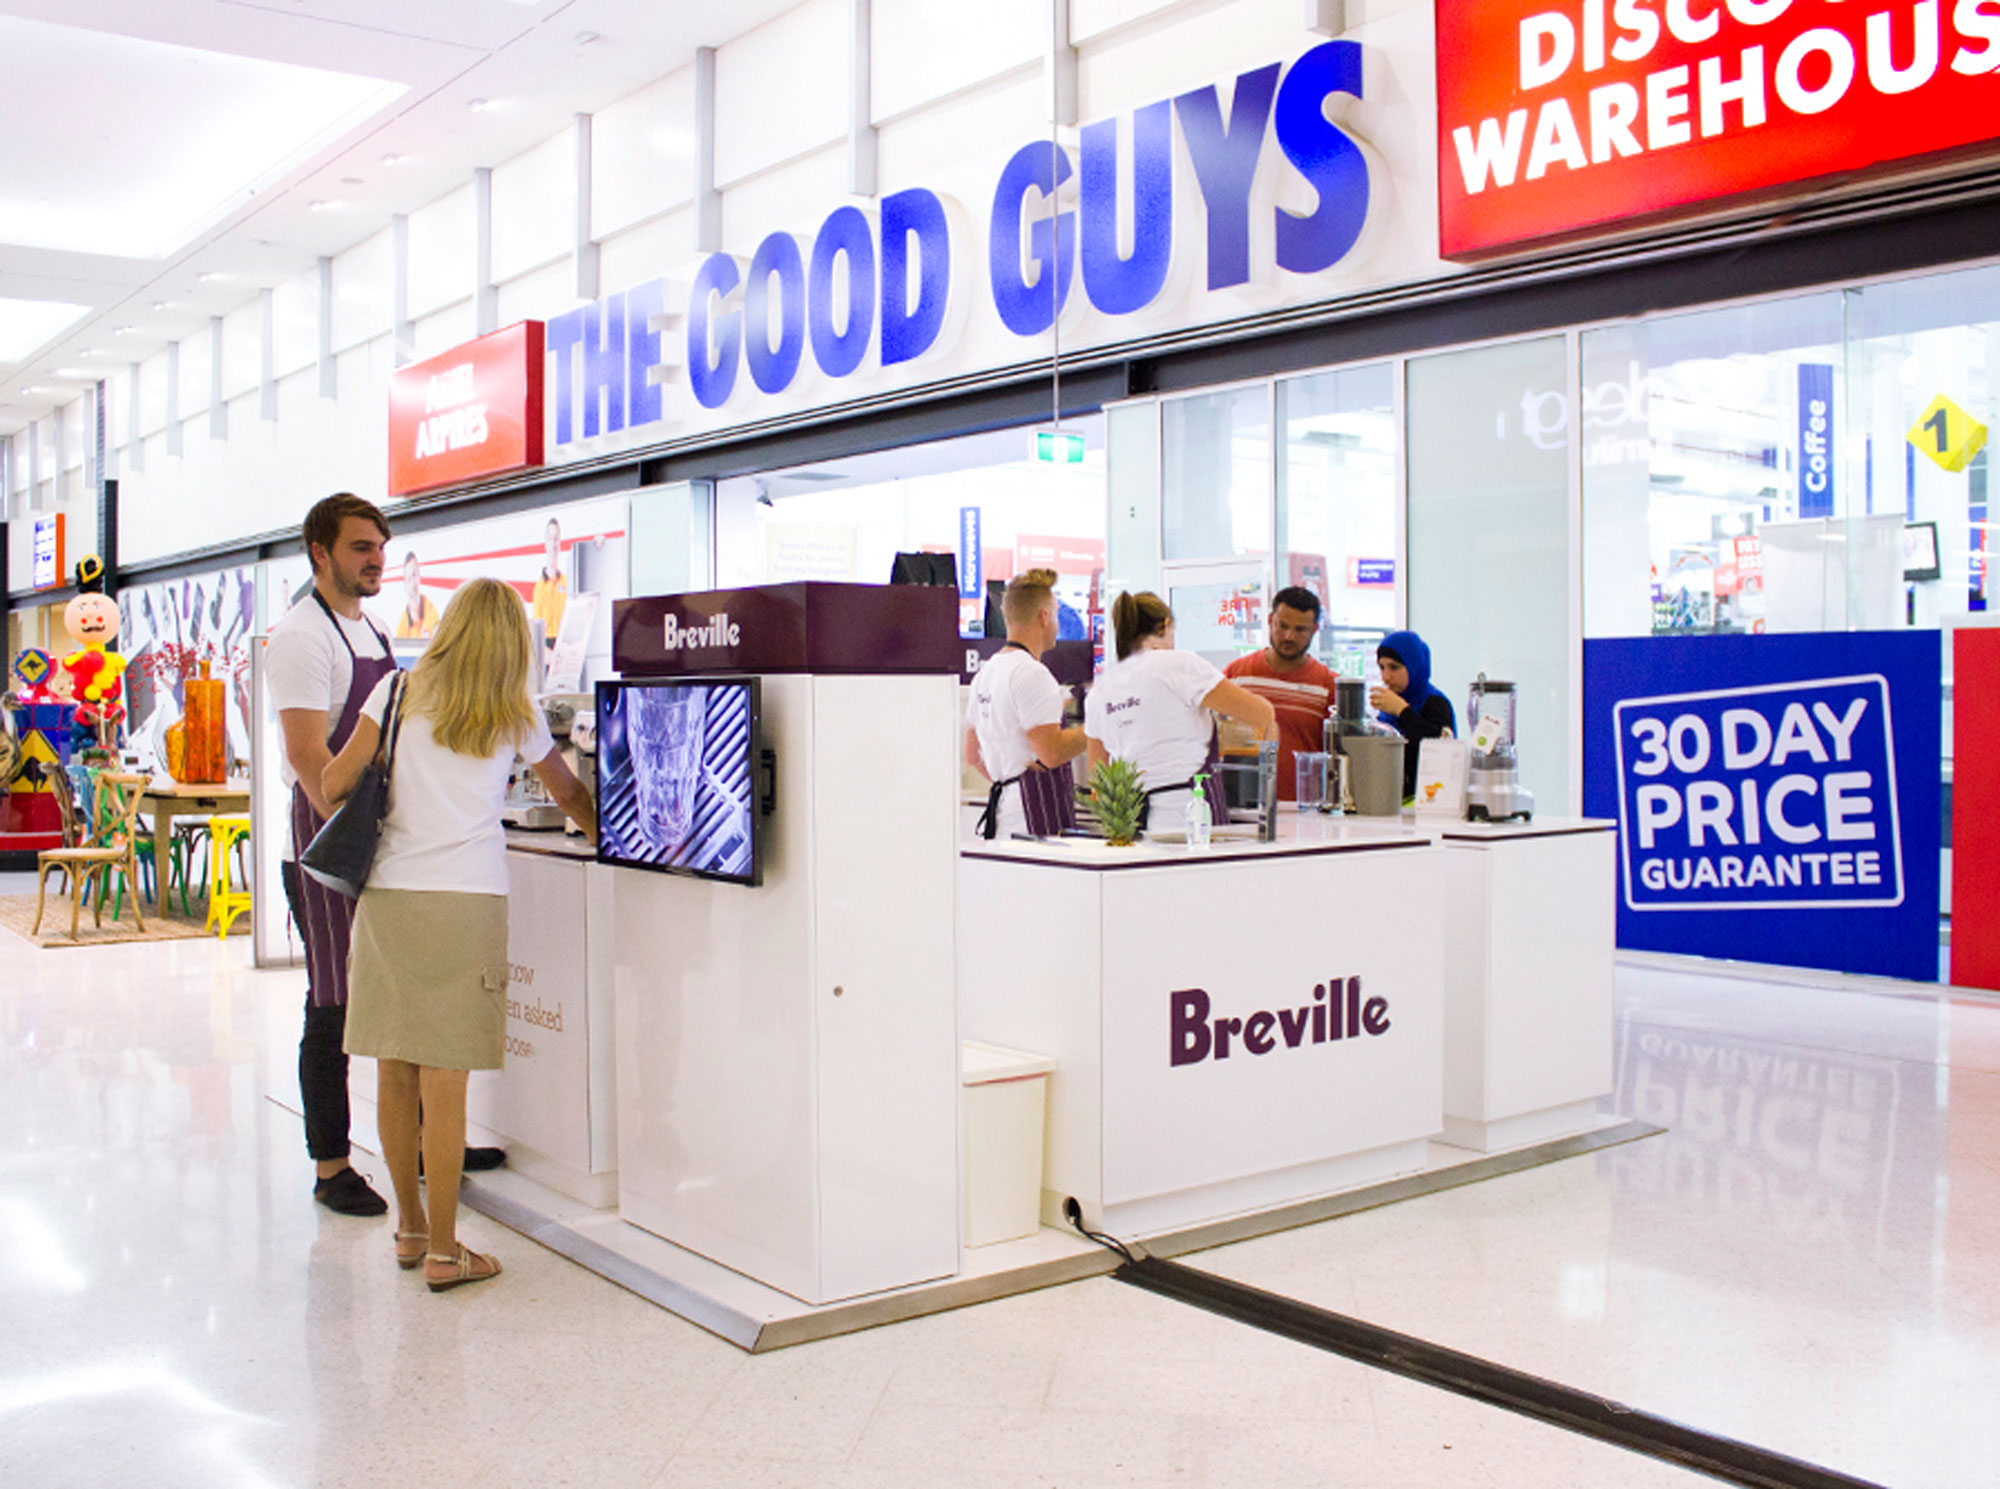 Breville Retail Pop up - Good Guys